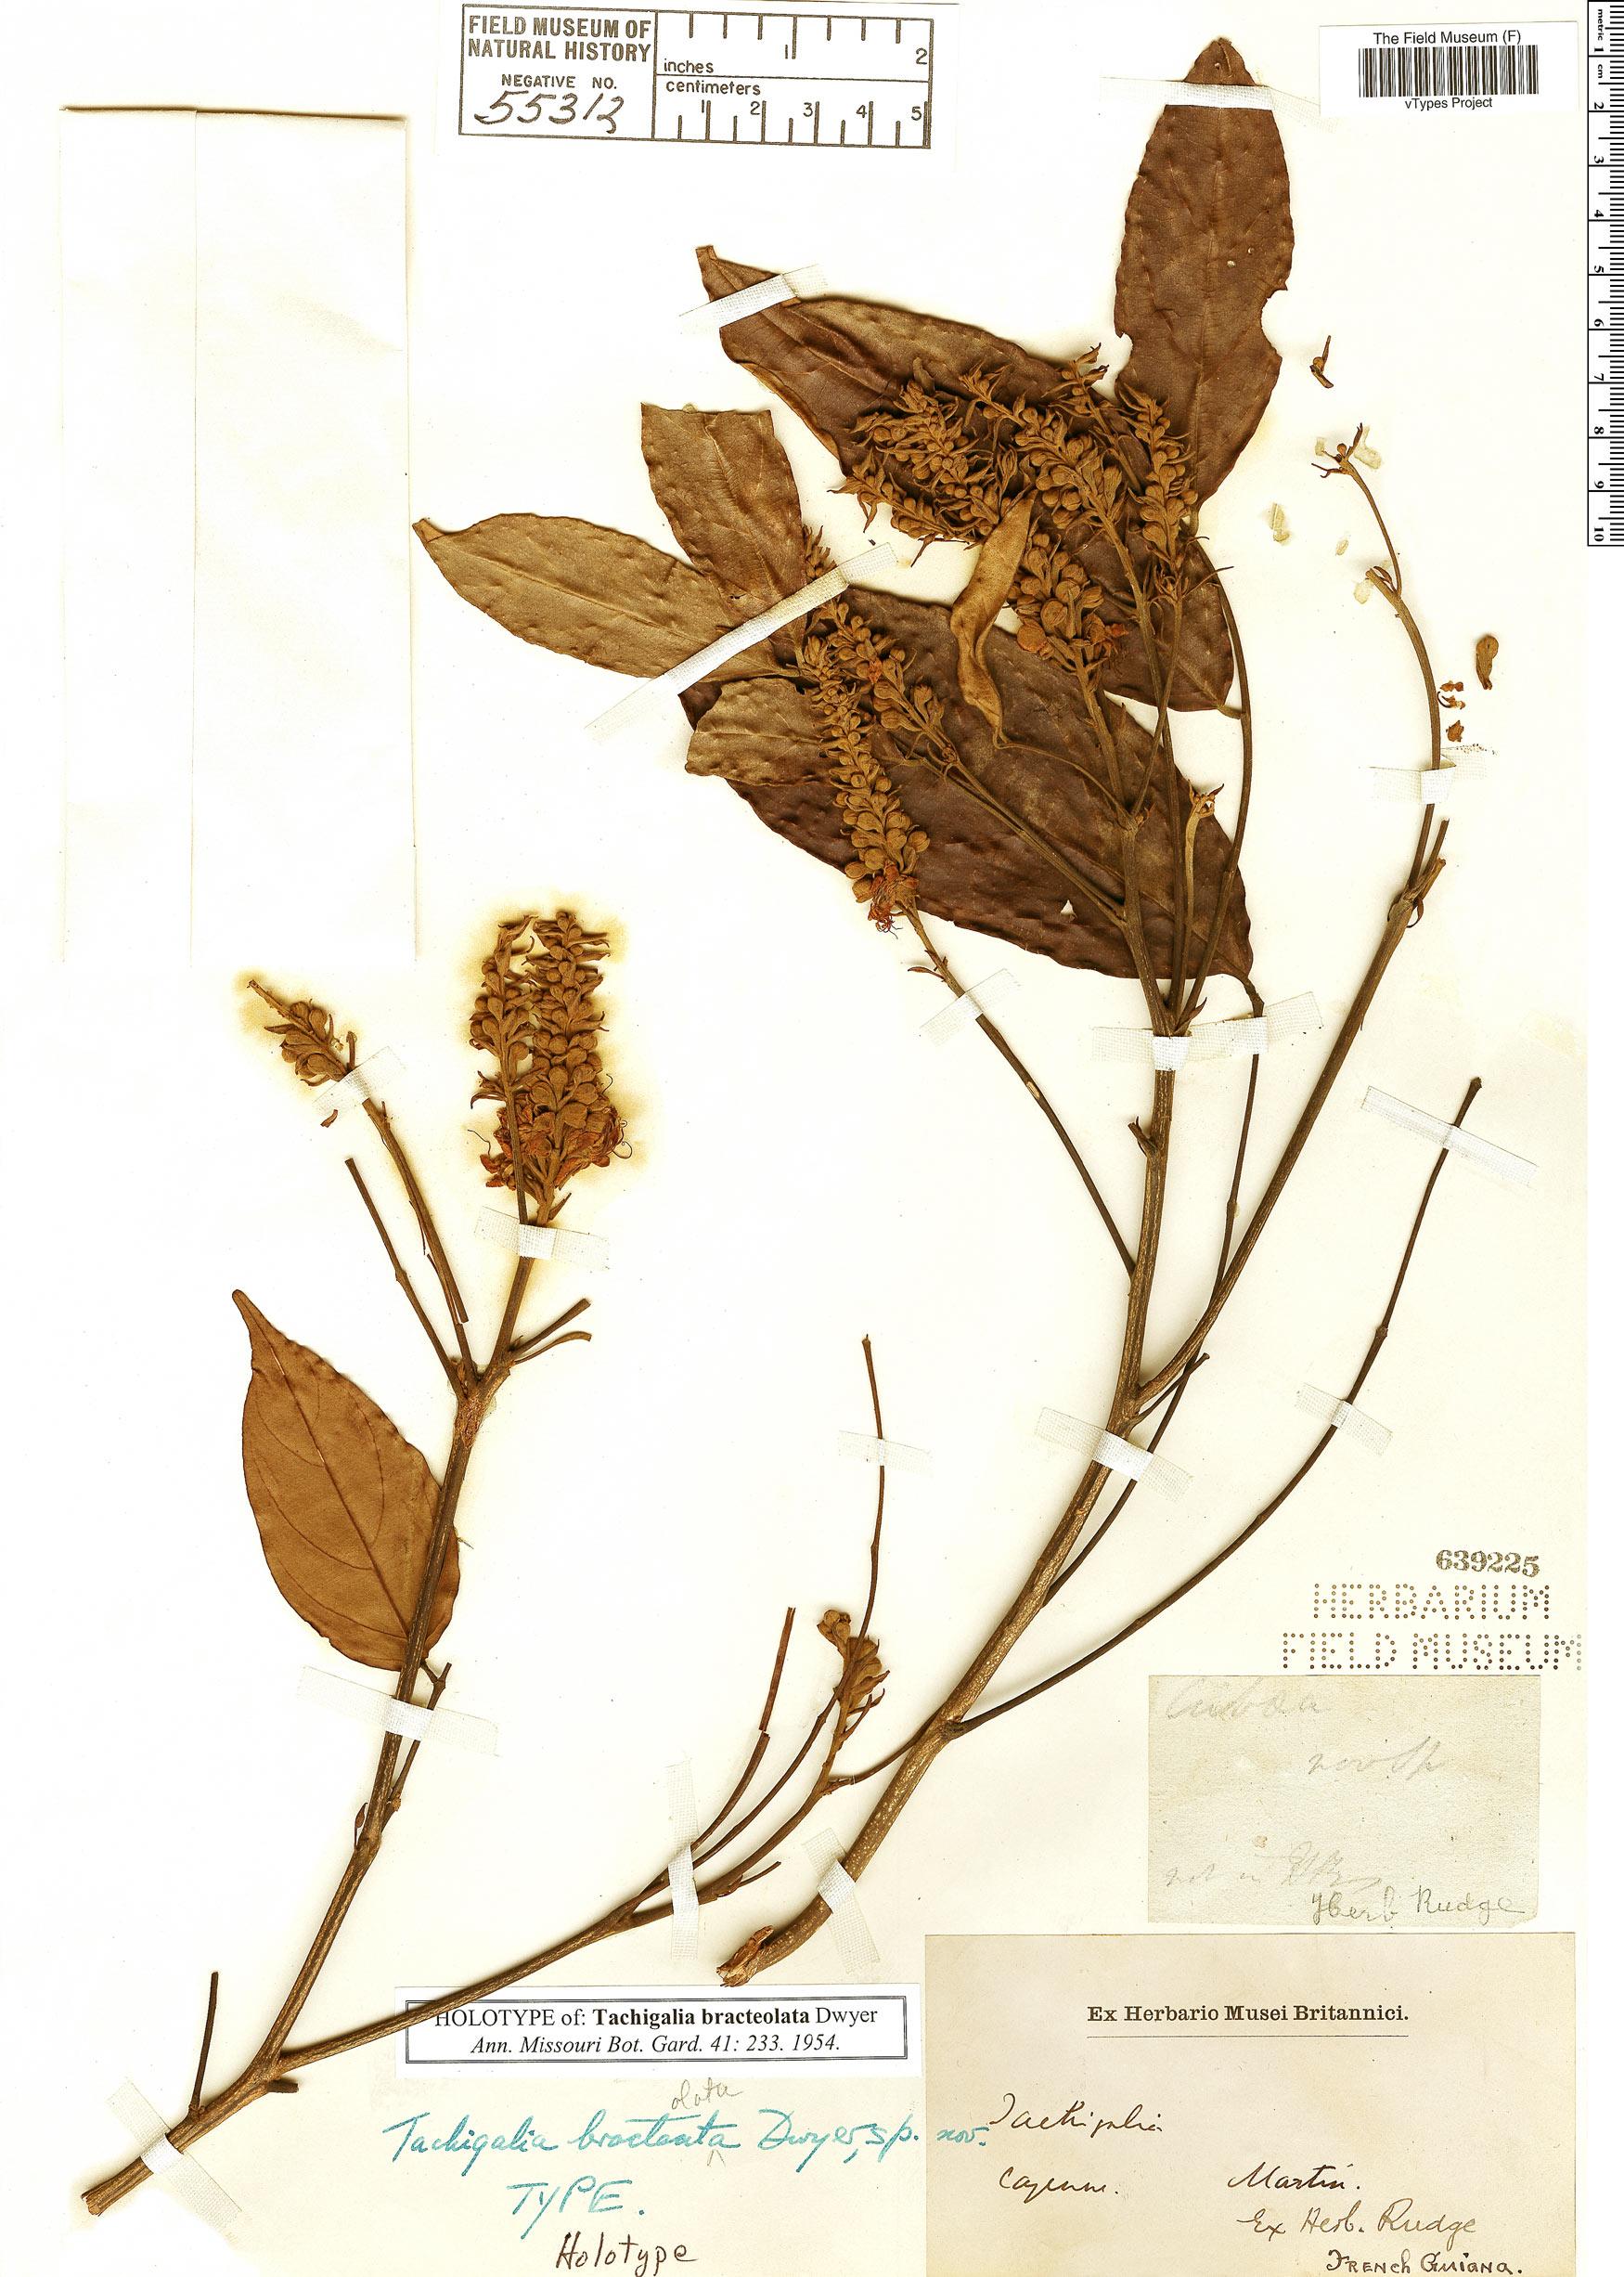 Specimen: Tachigali richardiana